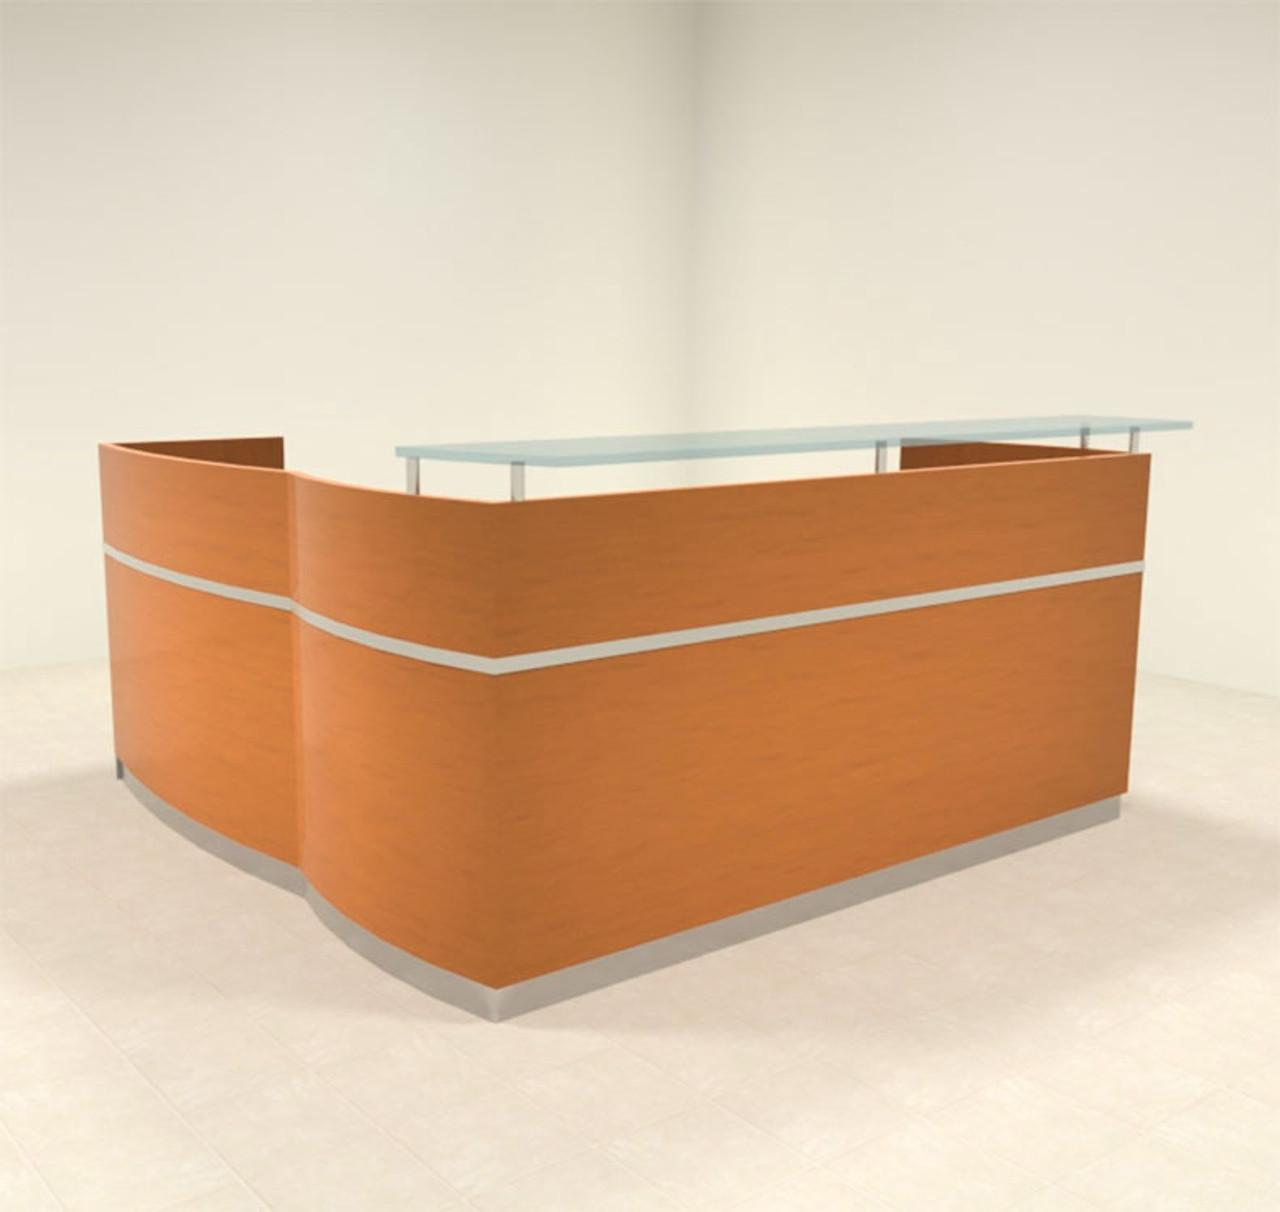 3pc Modern Glass L Shape Counter Reception Desk Set, #RO-NAP-R4